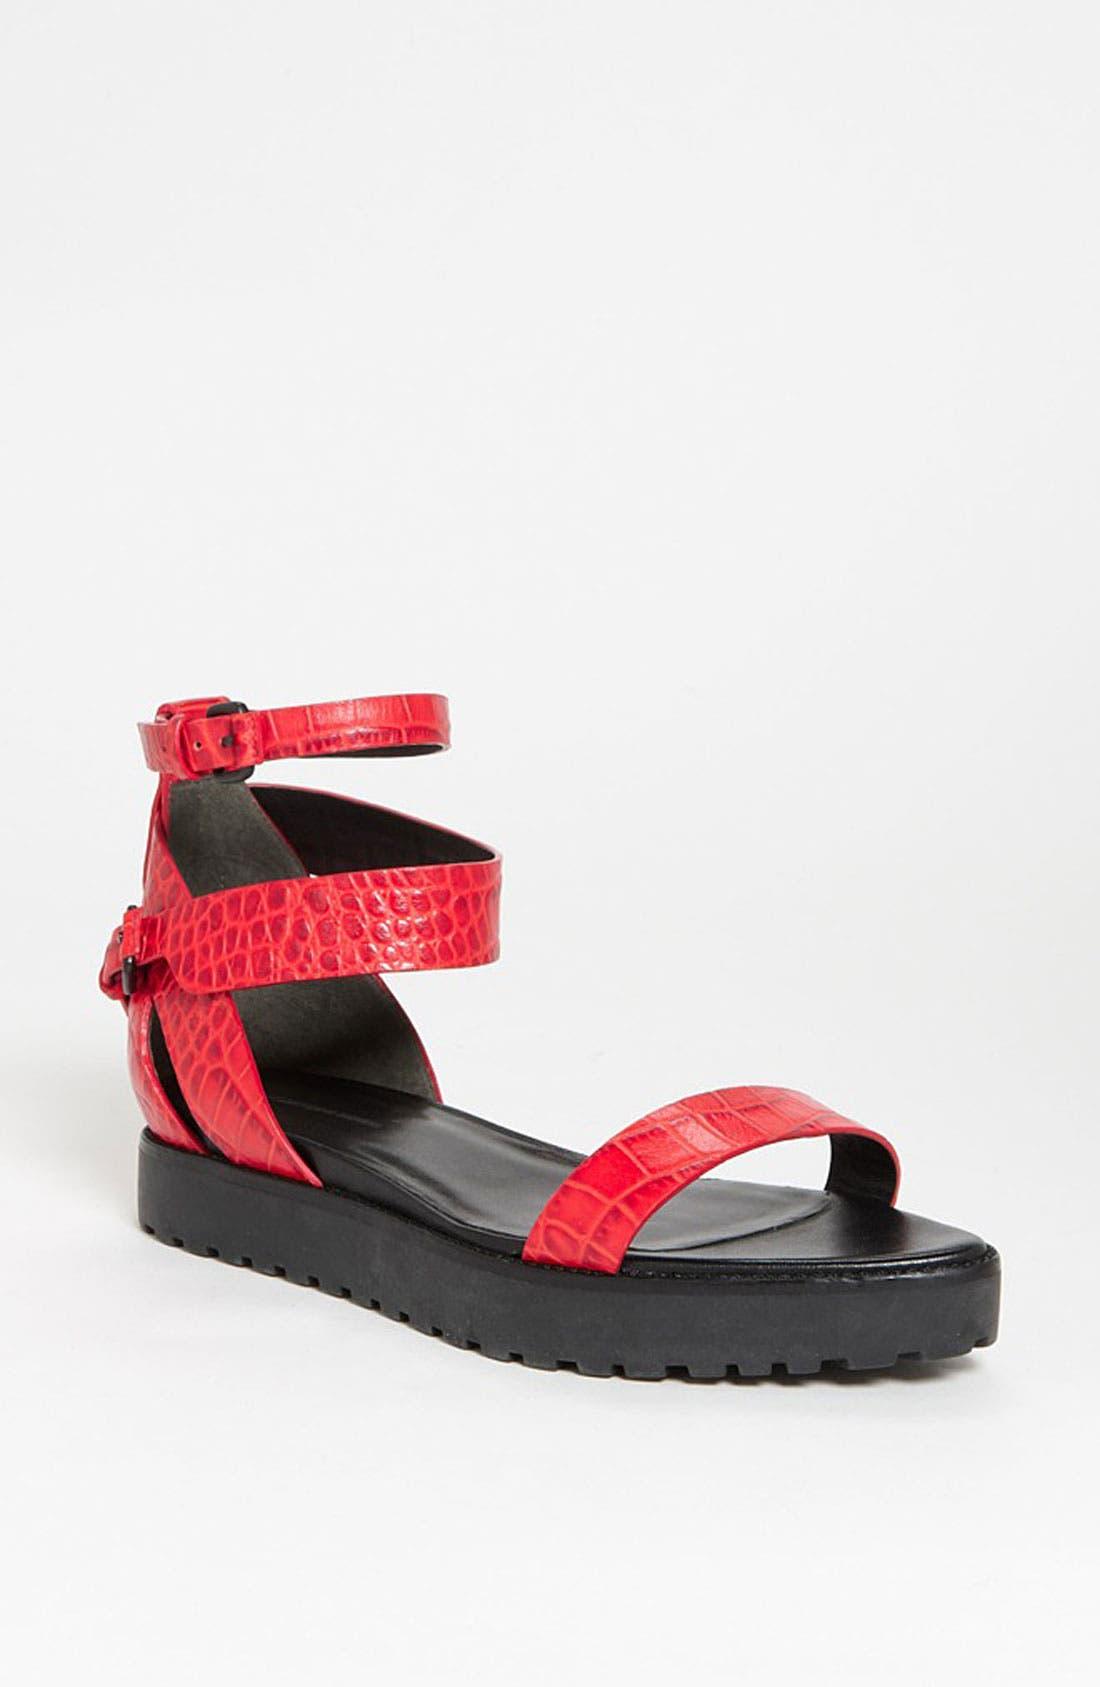 Alternate Image 1 Selected - Alexander Wang 'Jade' Sandal